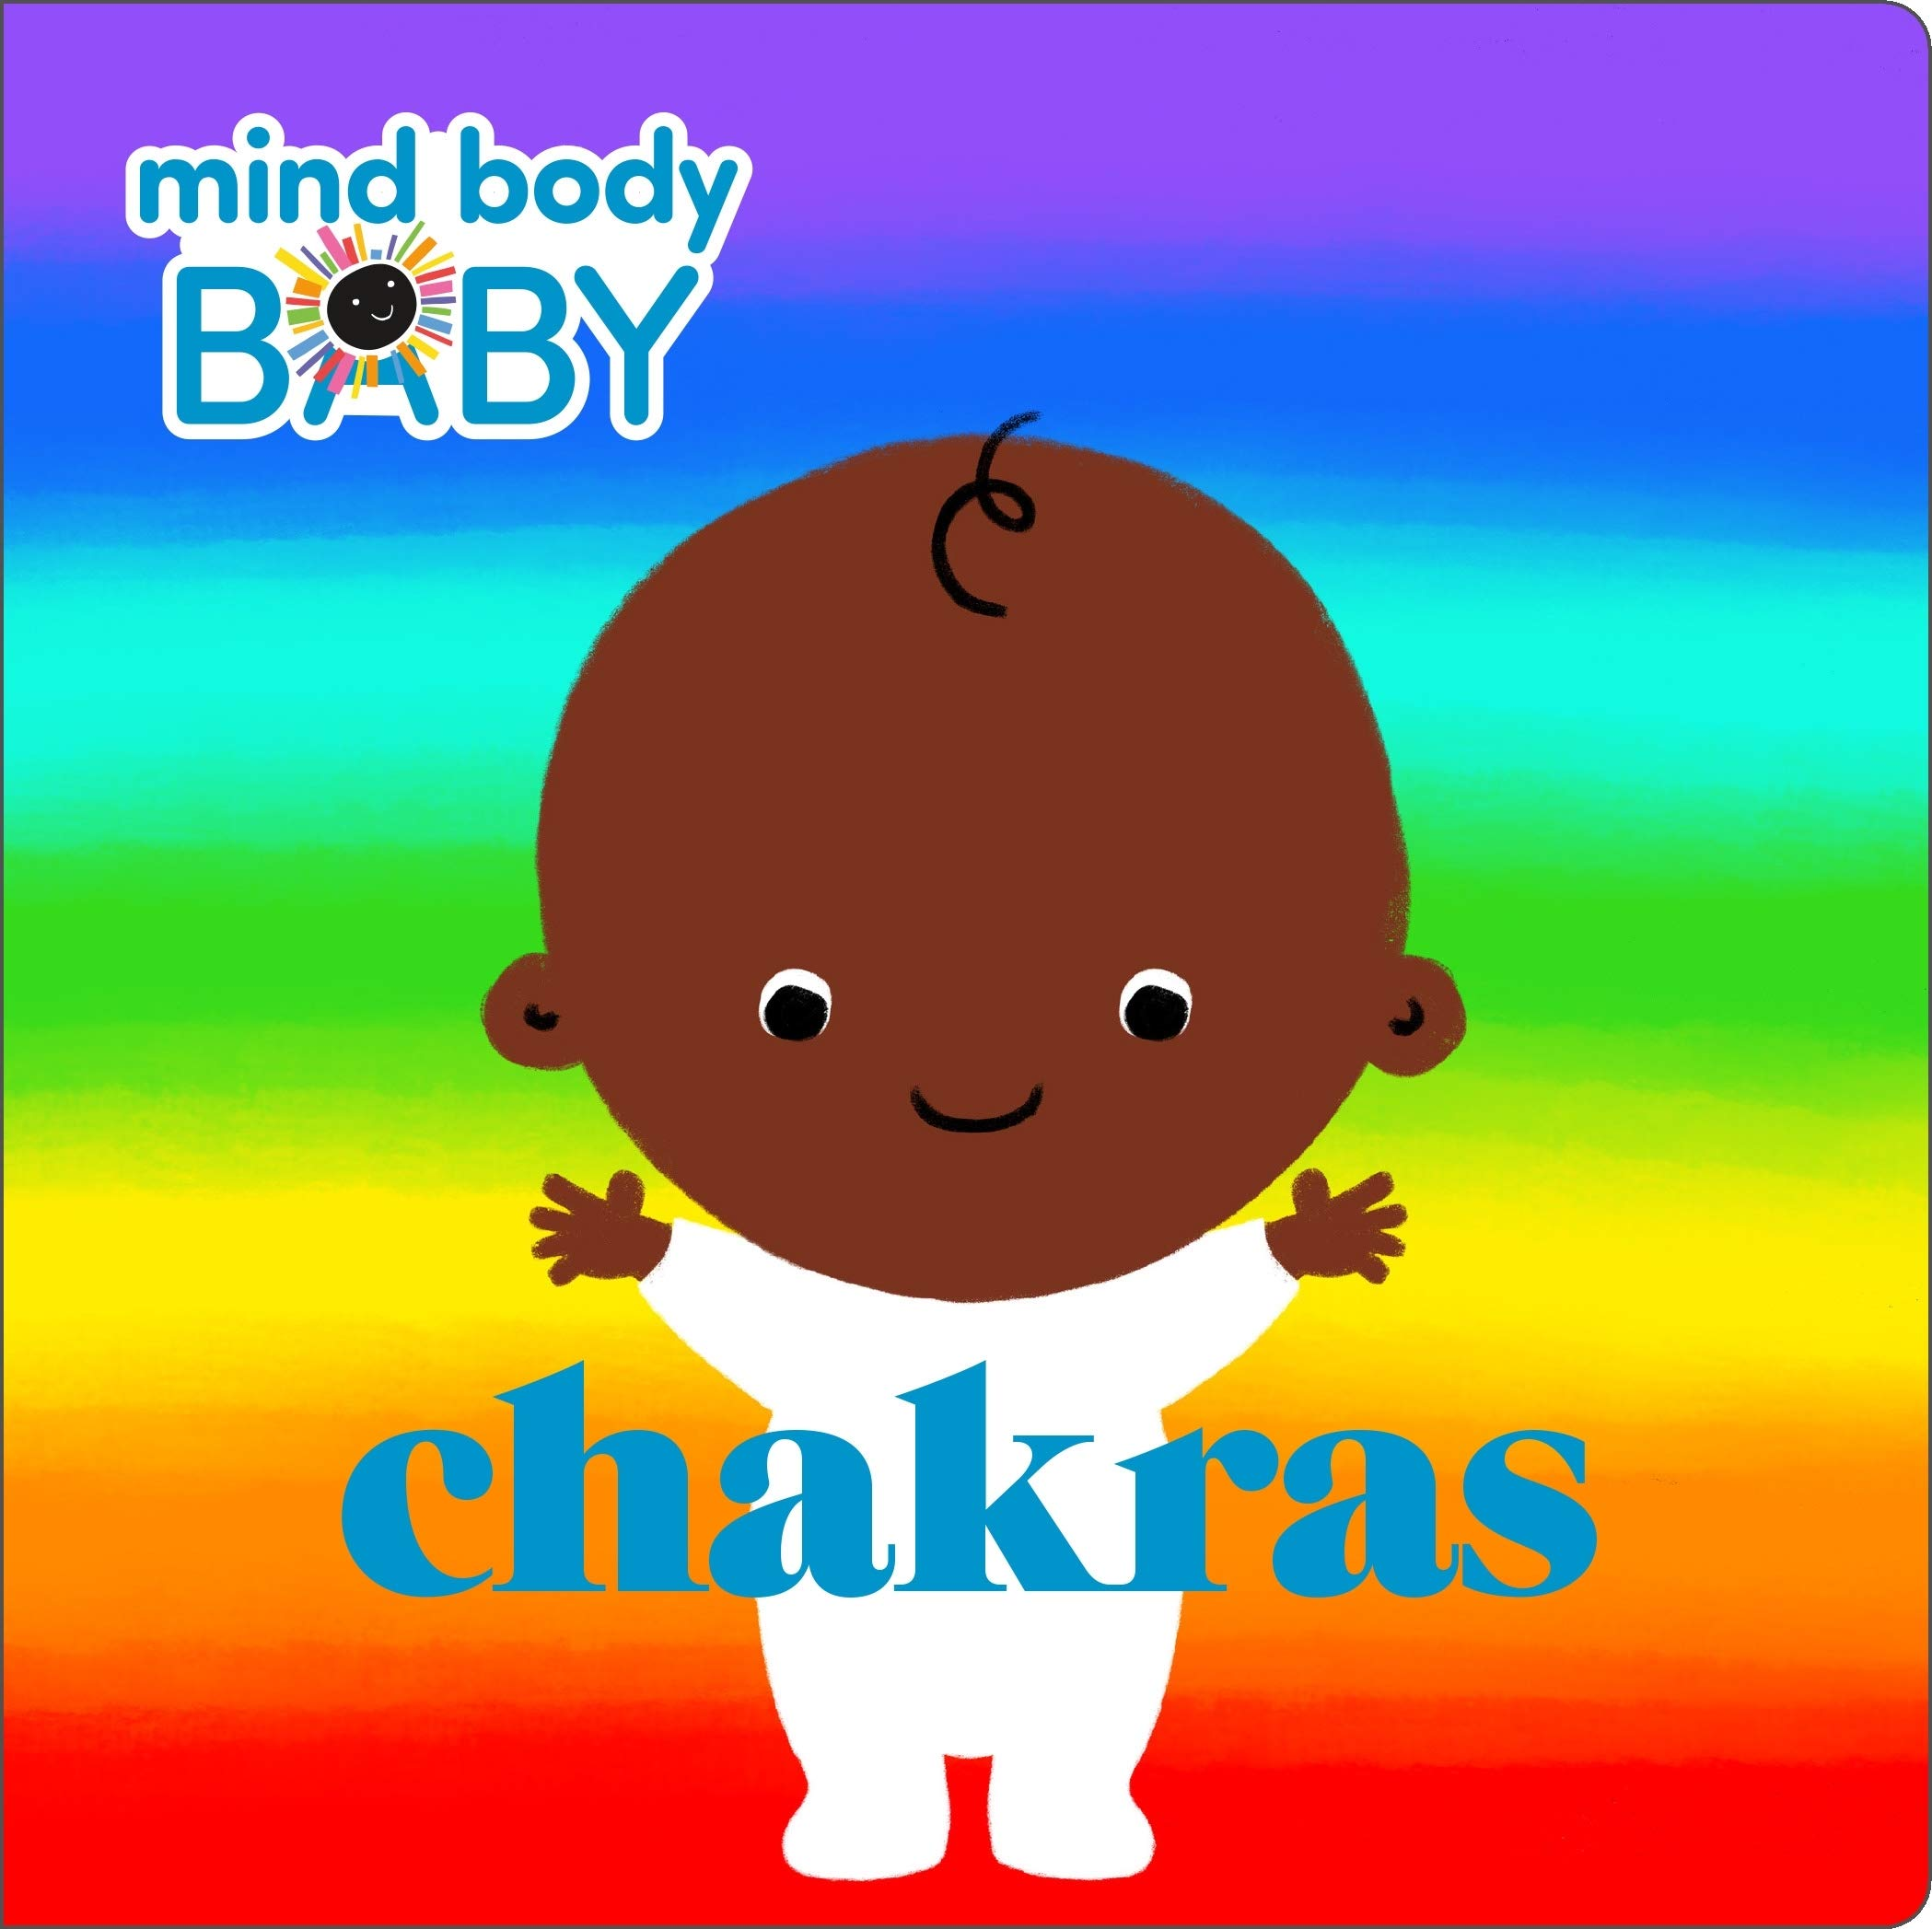 Amazon.com: Mind Body Baby: Chakras (9781250244260): Imprint: Books